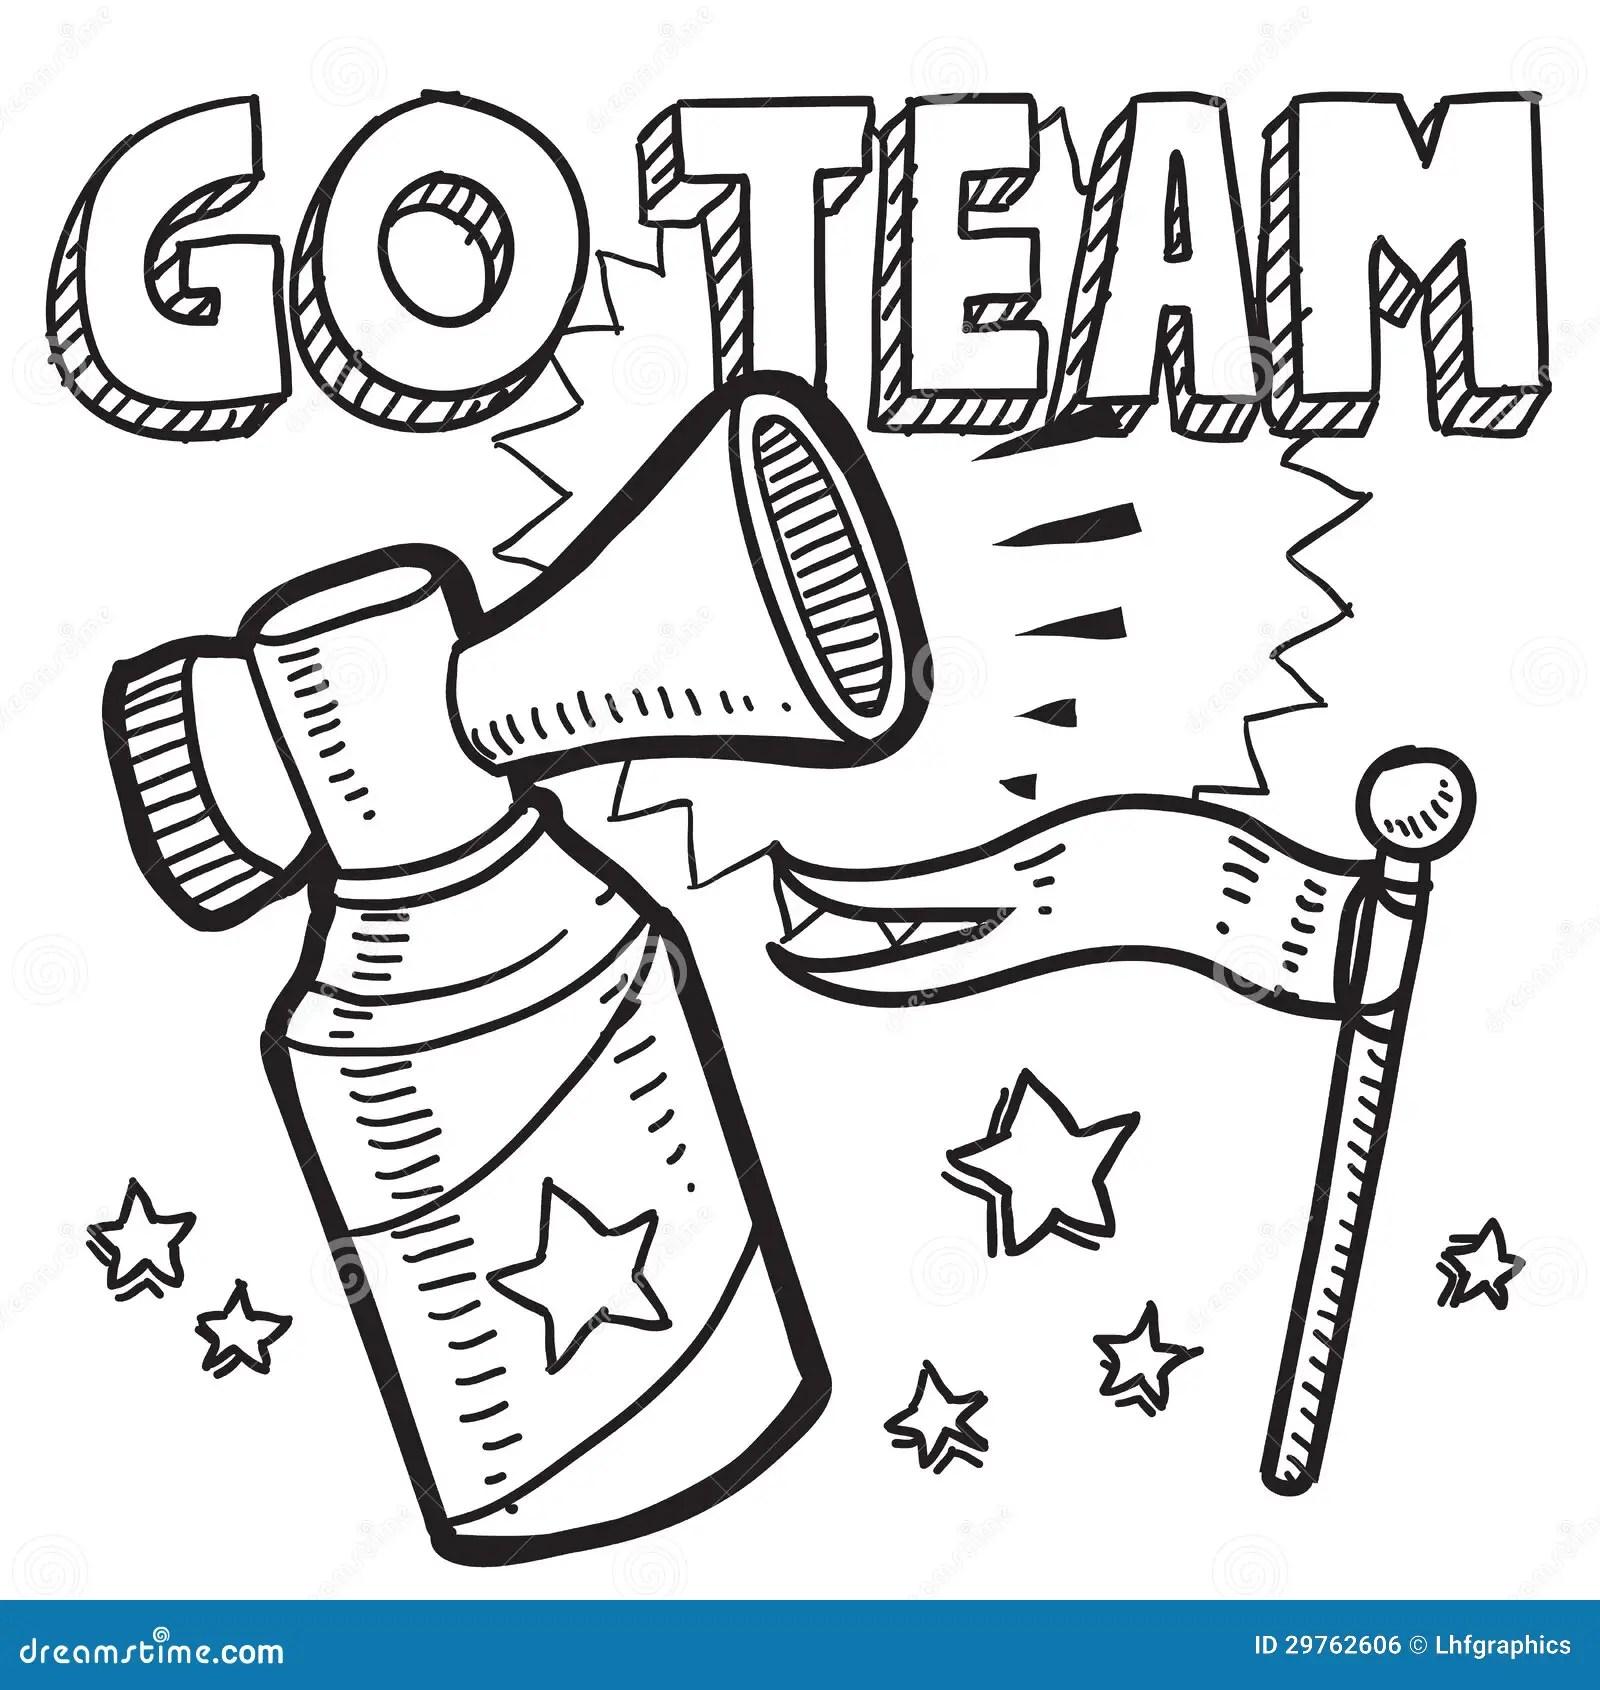 Go Team Sports Air Horn Sketch Stock Vector Illustration